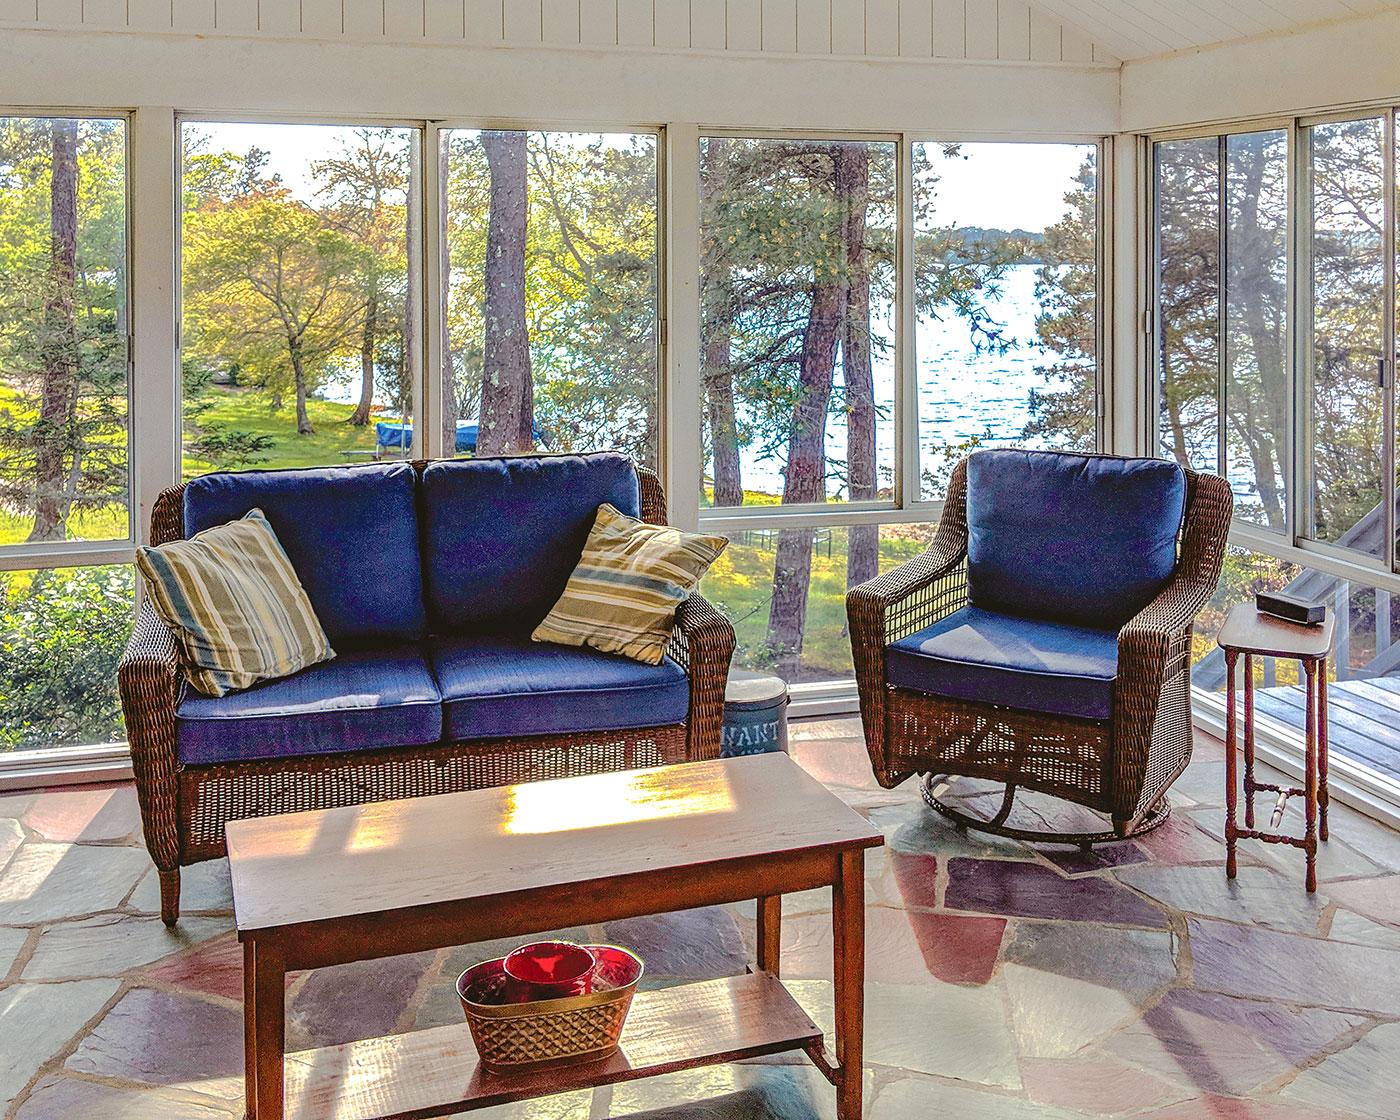 Screen porch addition by Longfellow Design Build